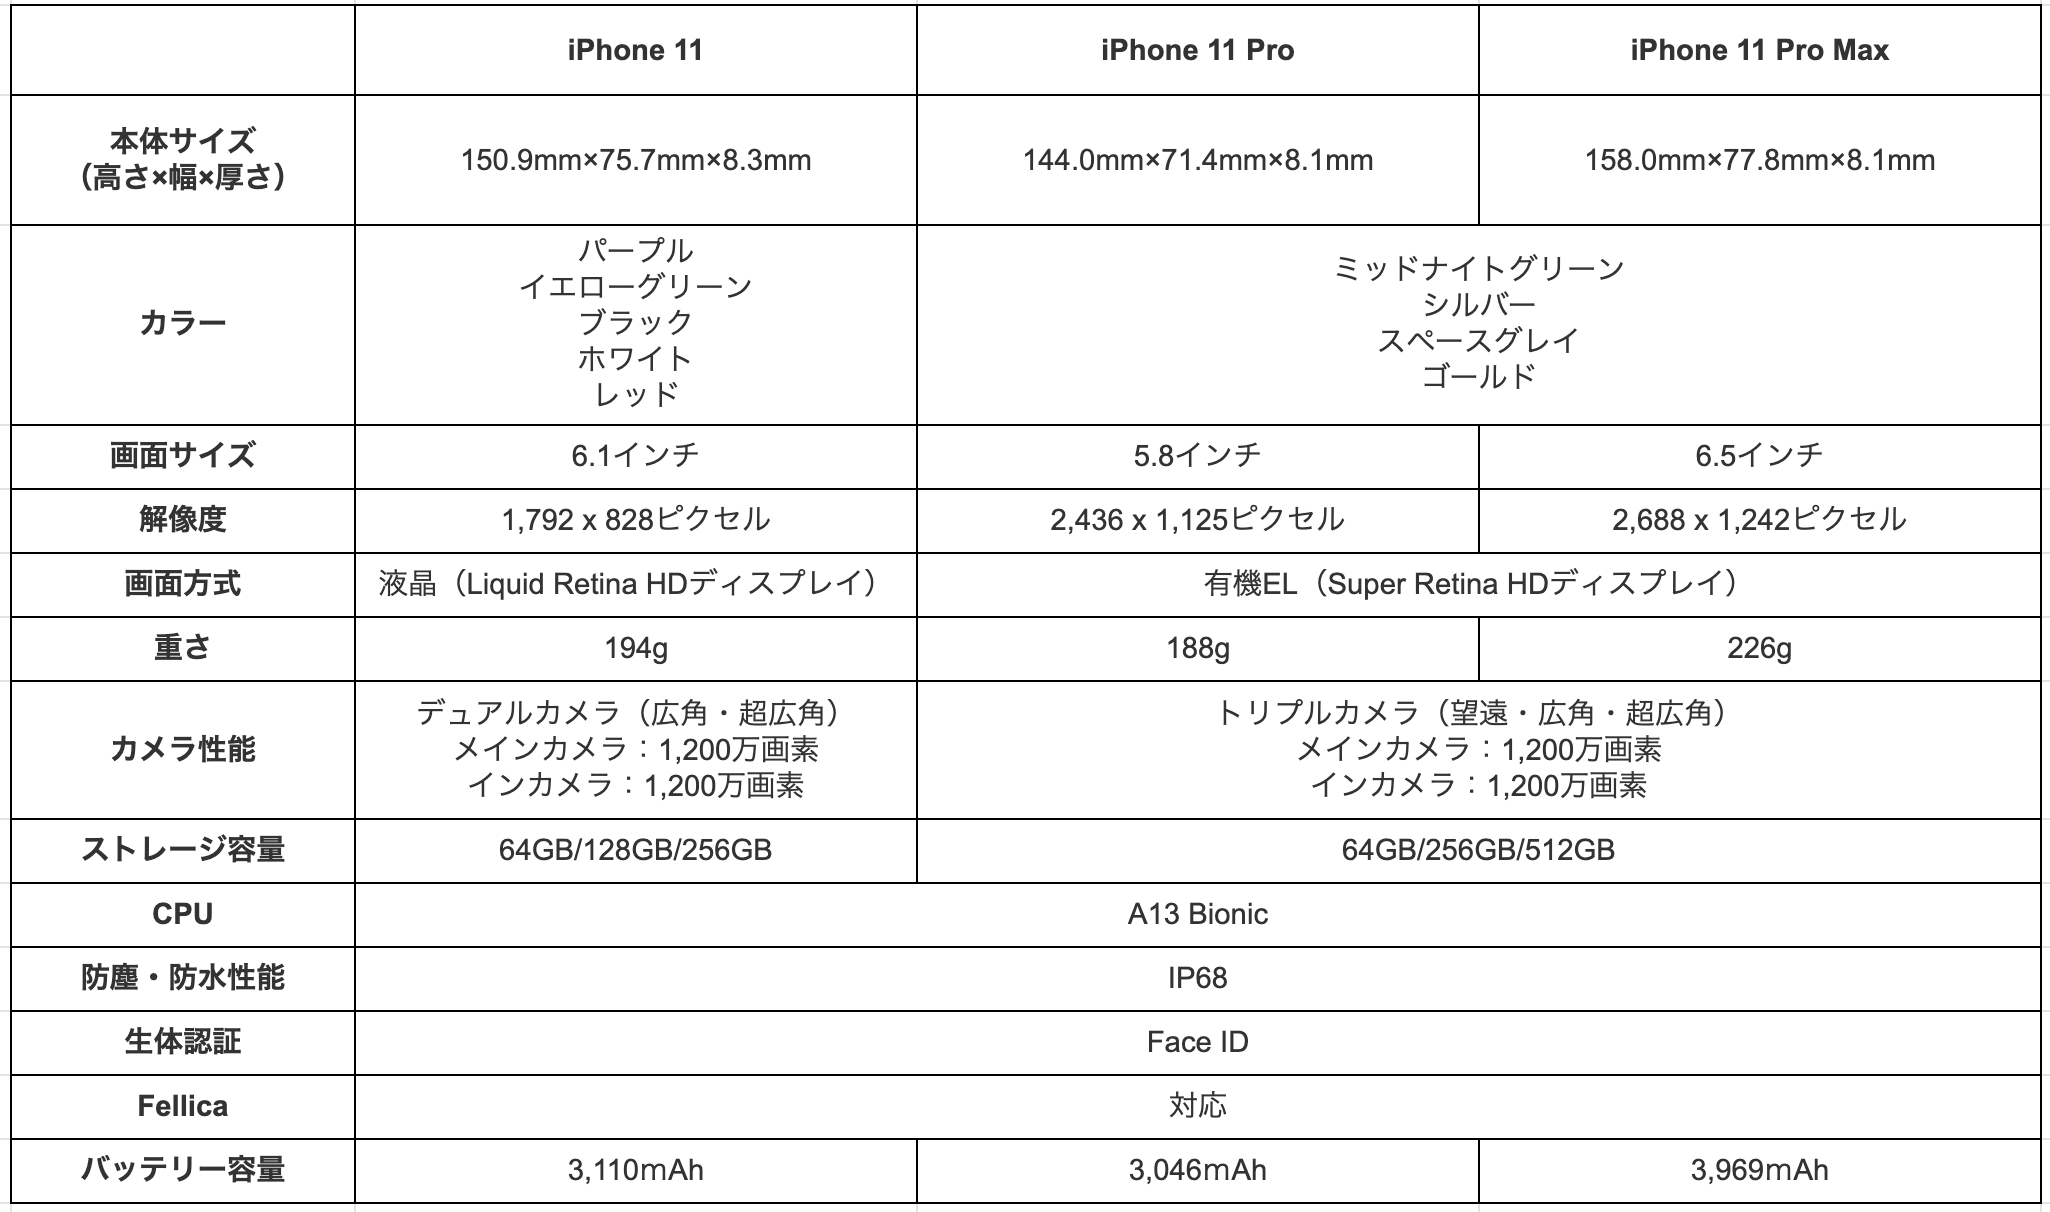 Spec comparison table